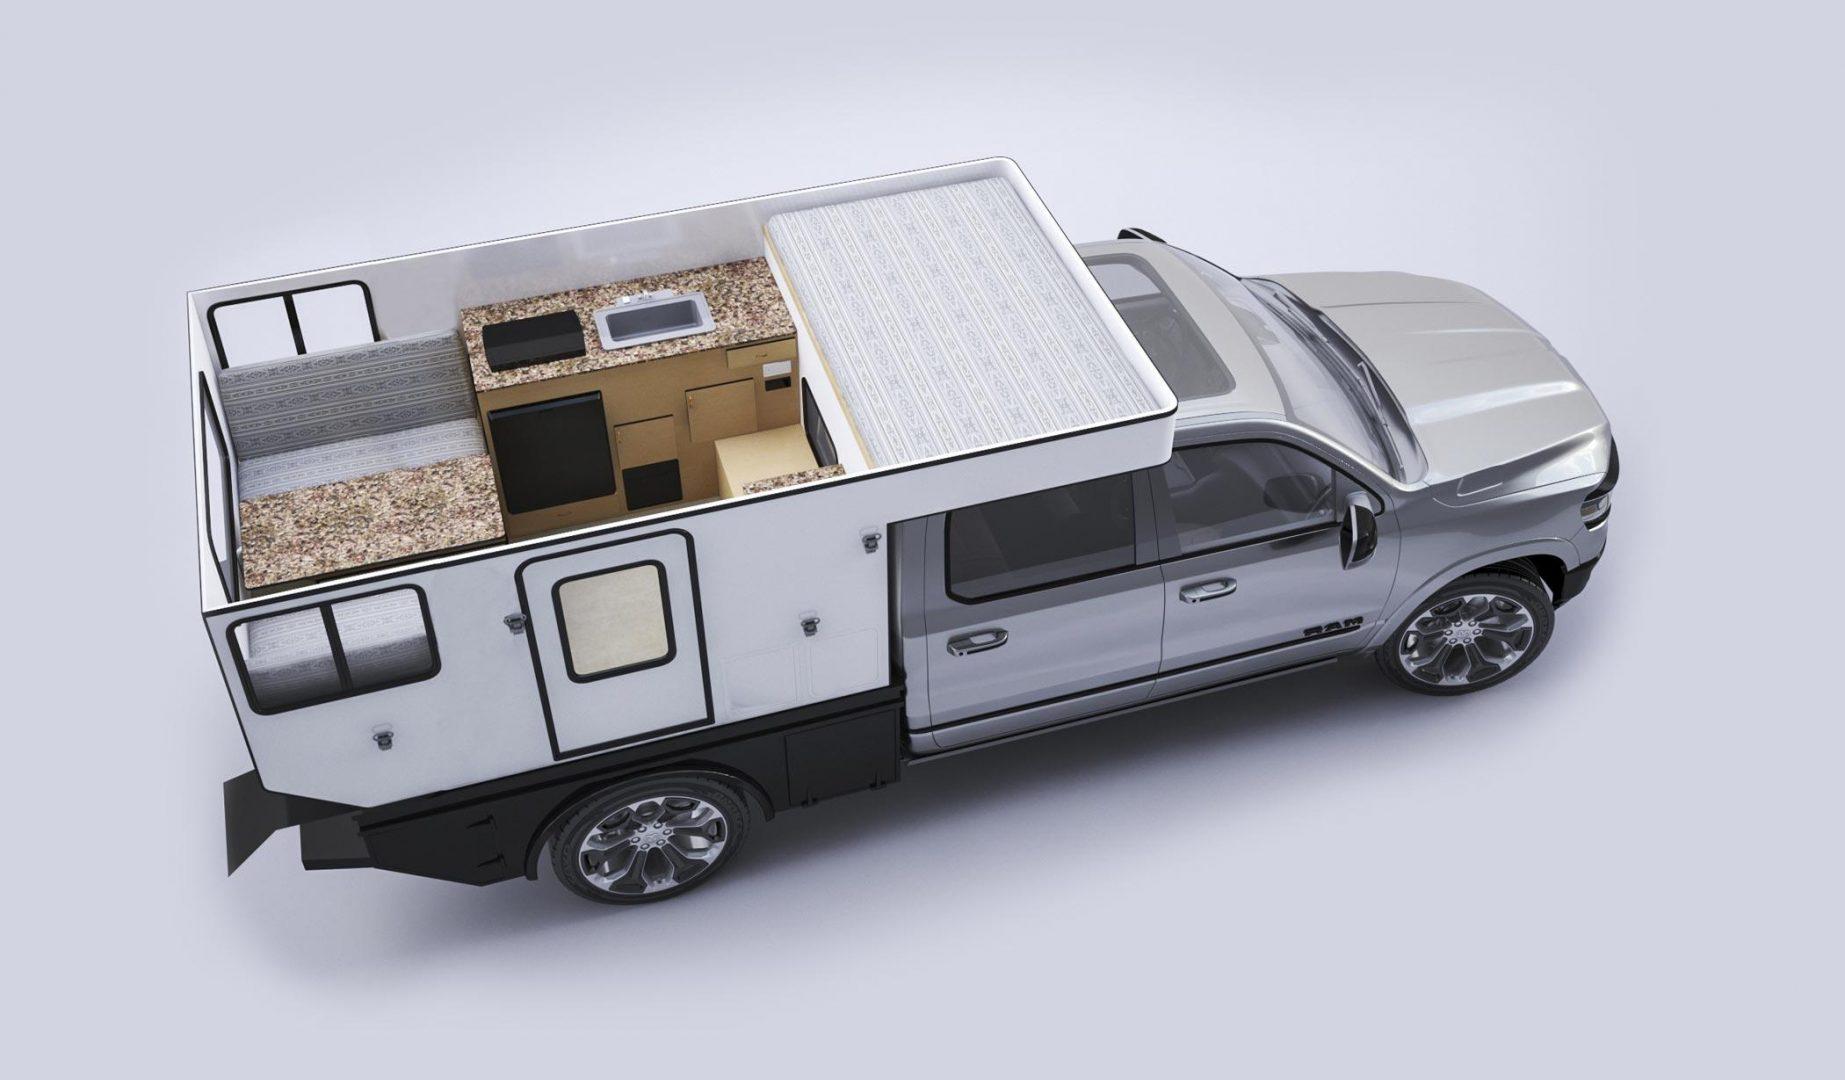 Flat Bed Model: $28,995